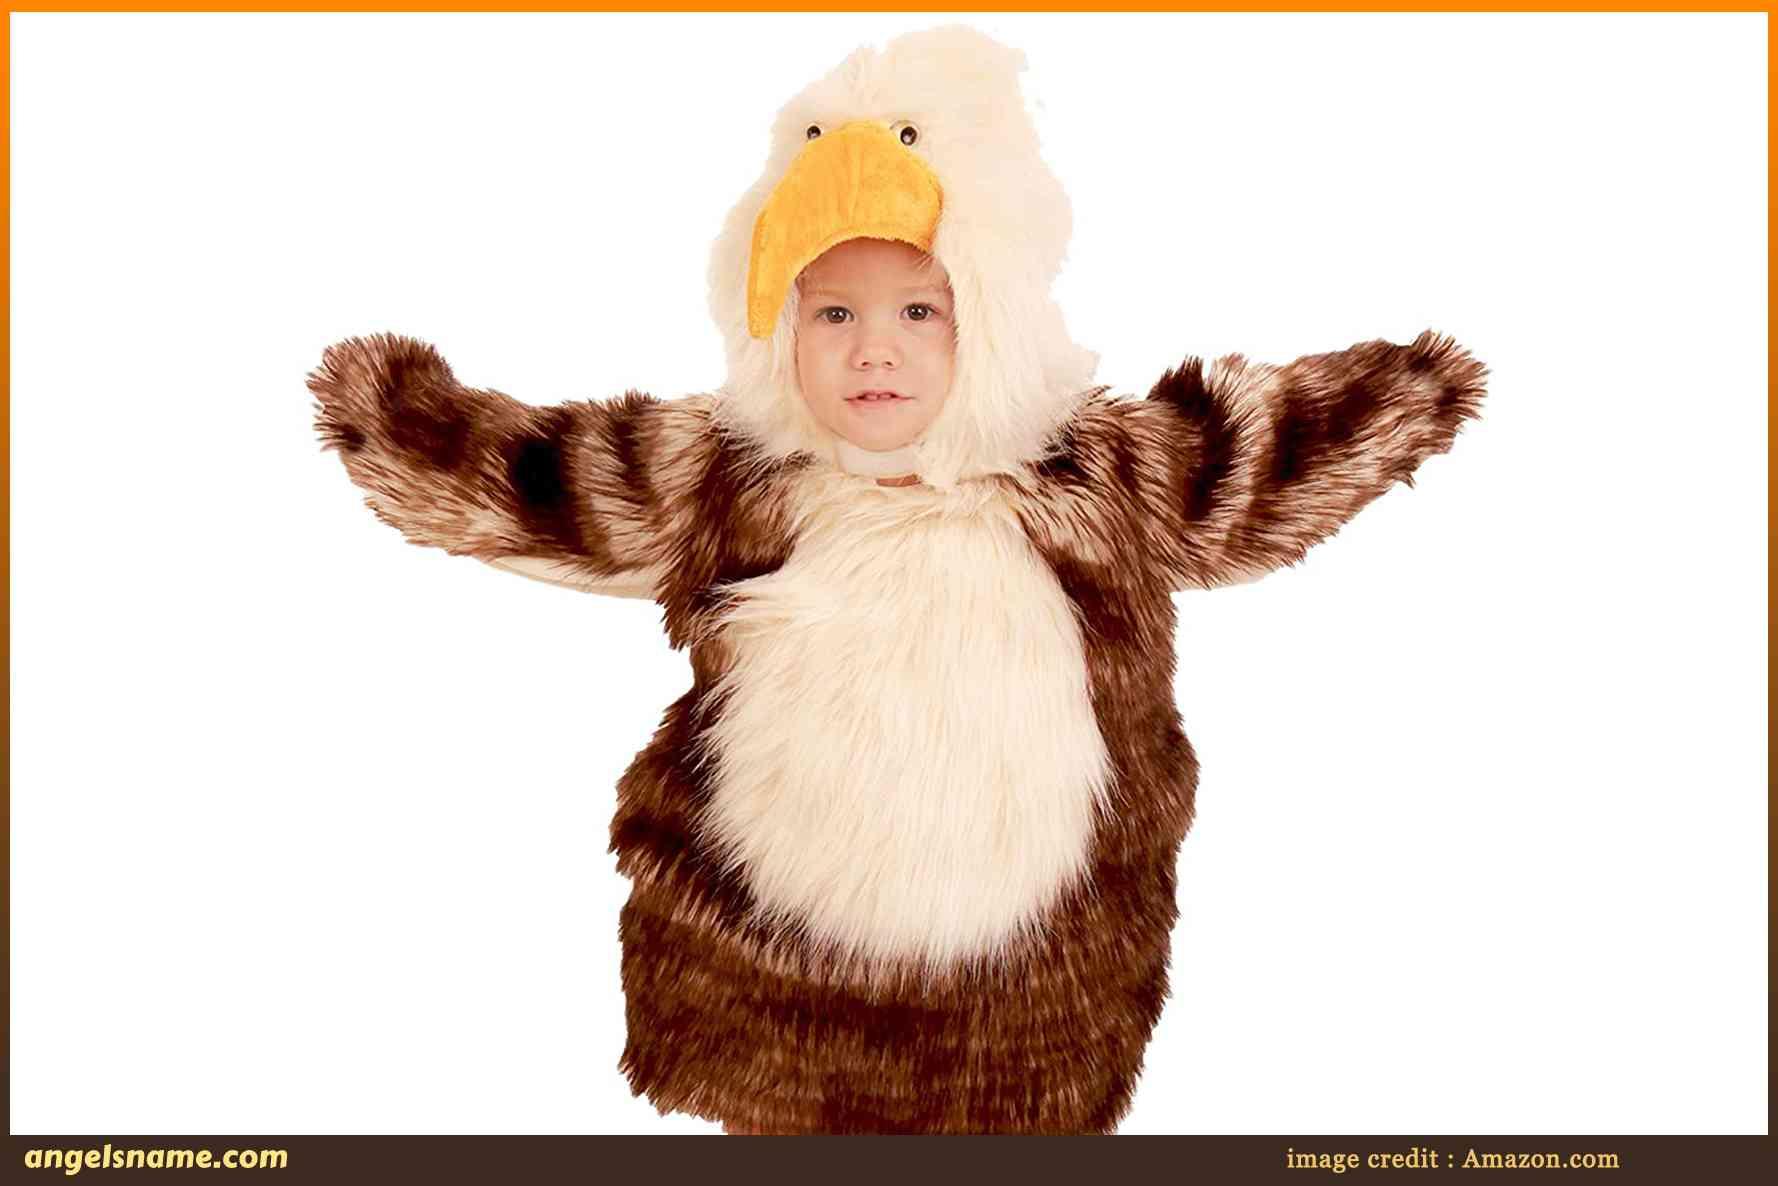 140 Baby Boy Names That Mean Eagle